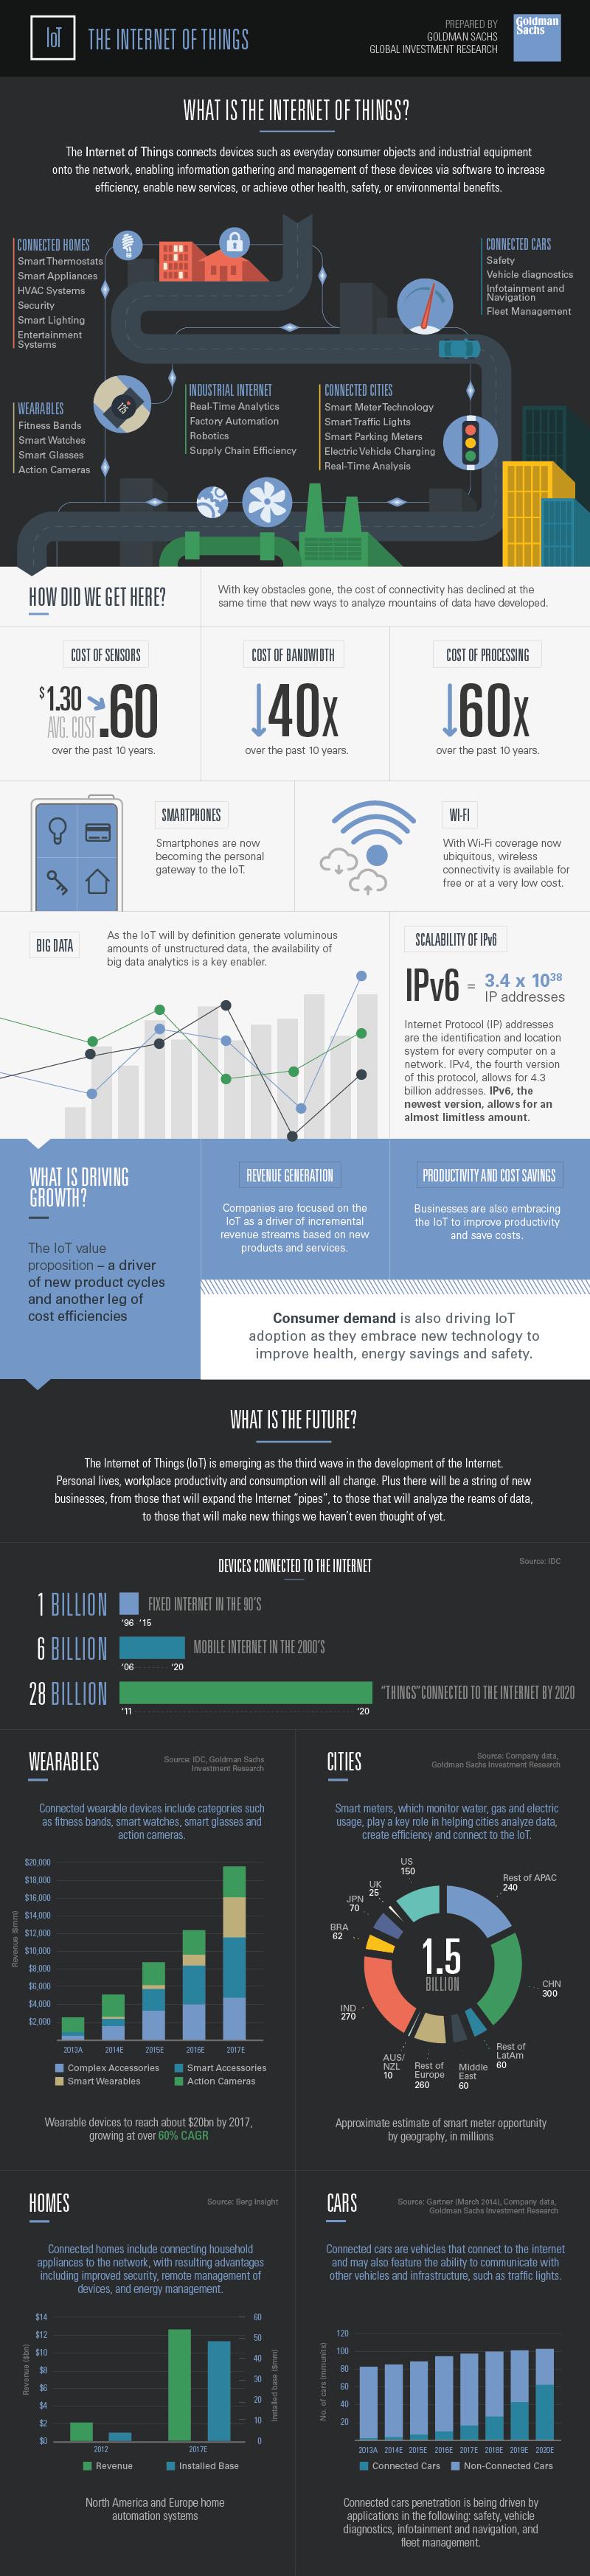 Goldman-Sachs-IoT-infographic-800x3188